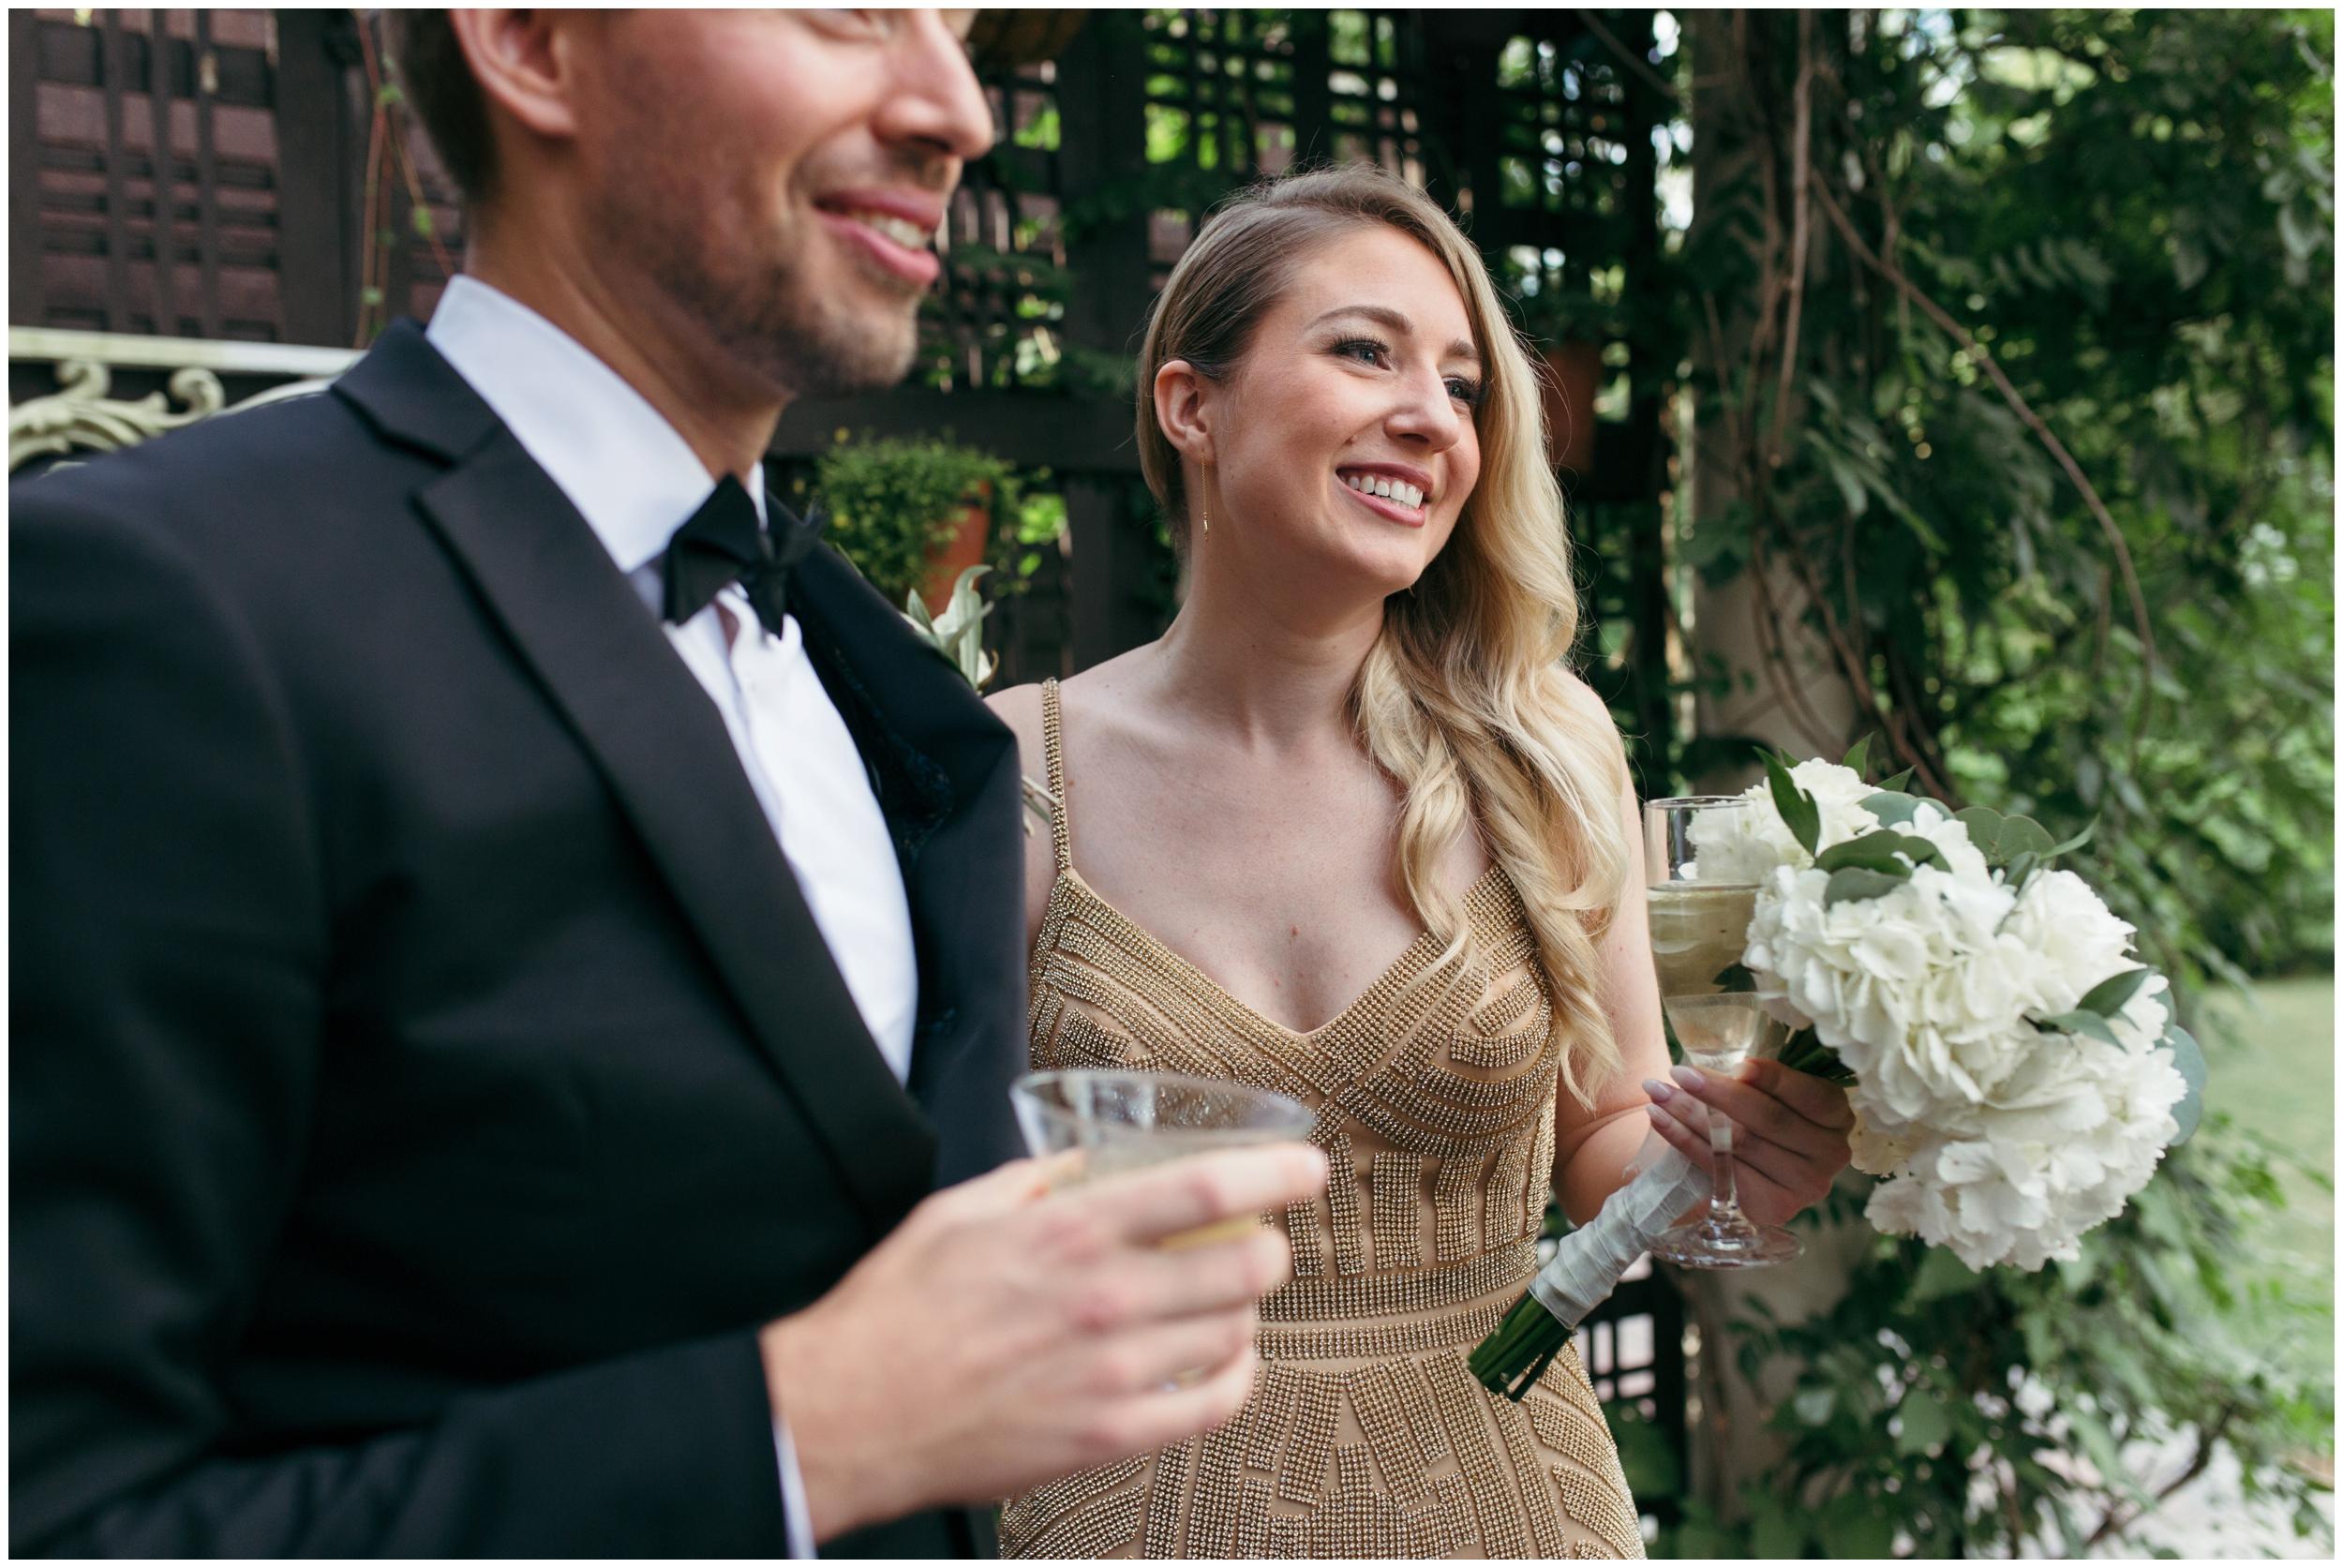 Willowdale-Estate-Wedding-Bailey-Q-Photo-Boston-Wedding-Photographer-052.JPG